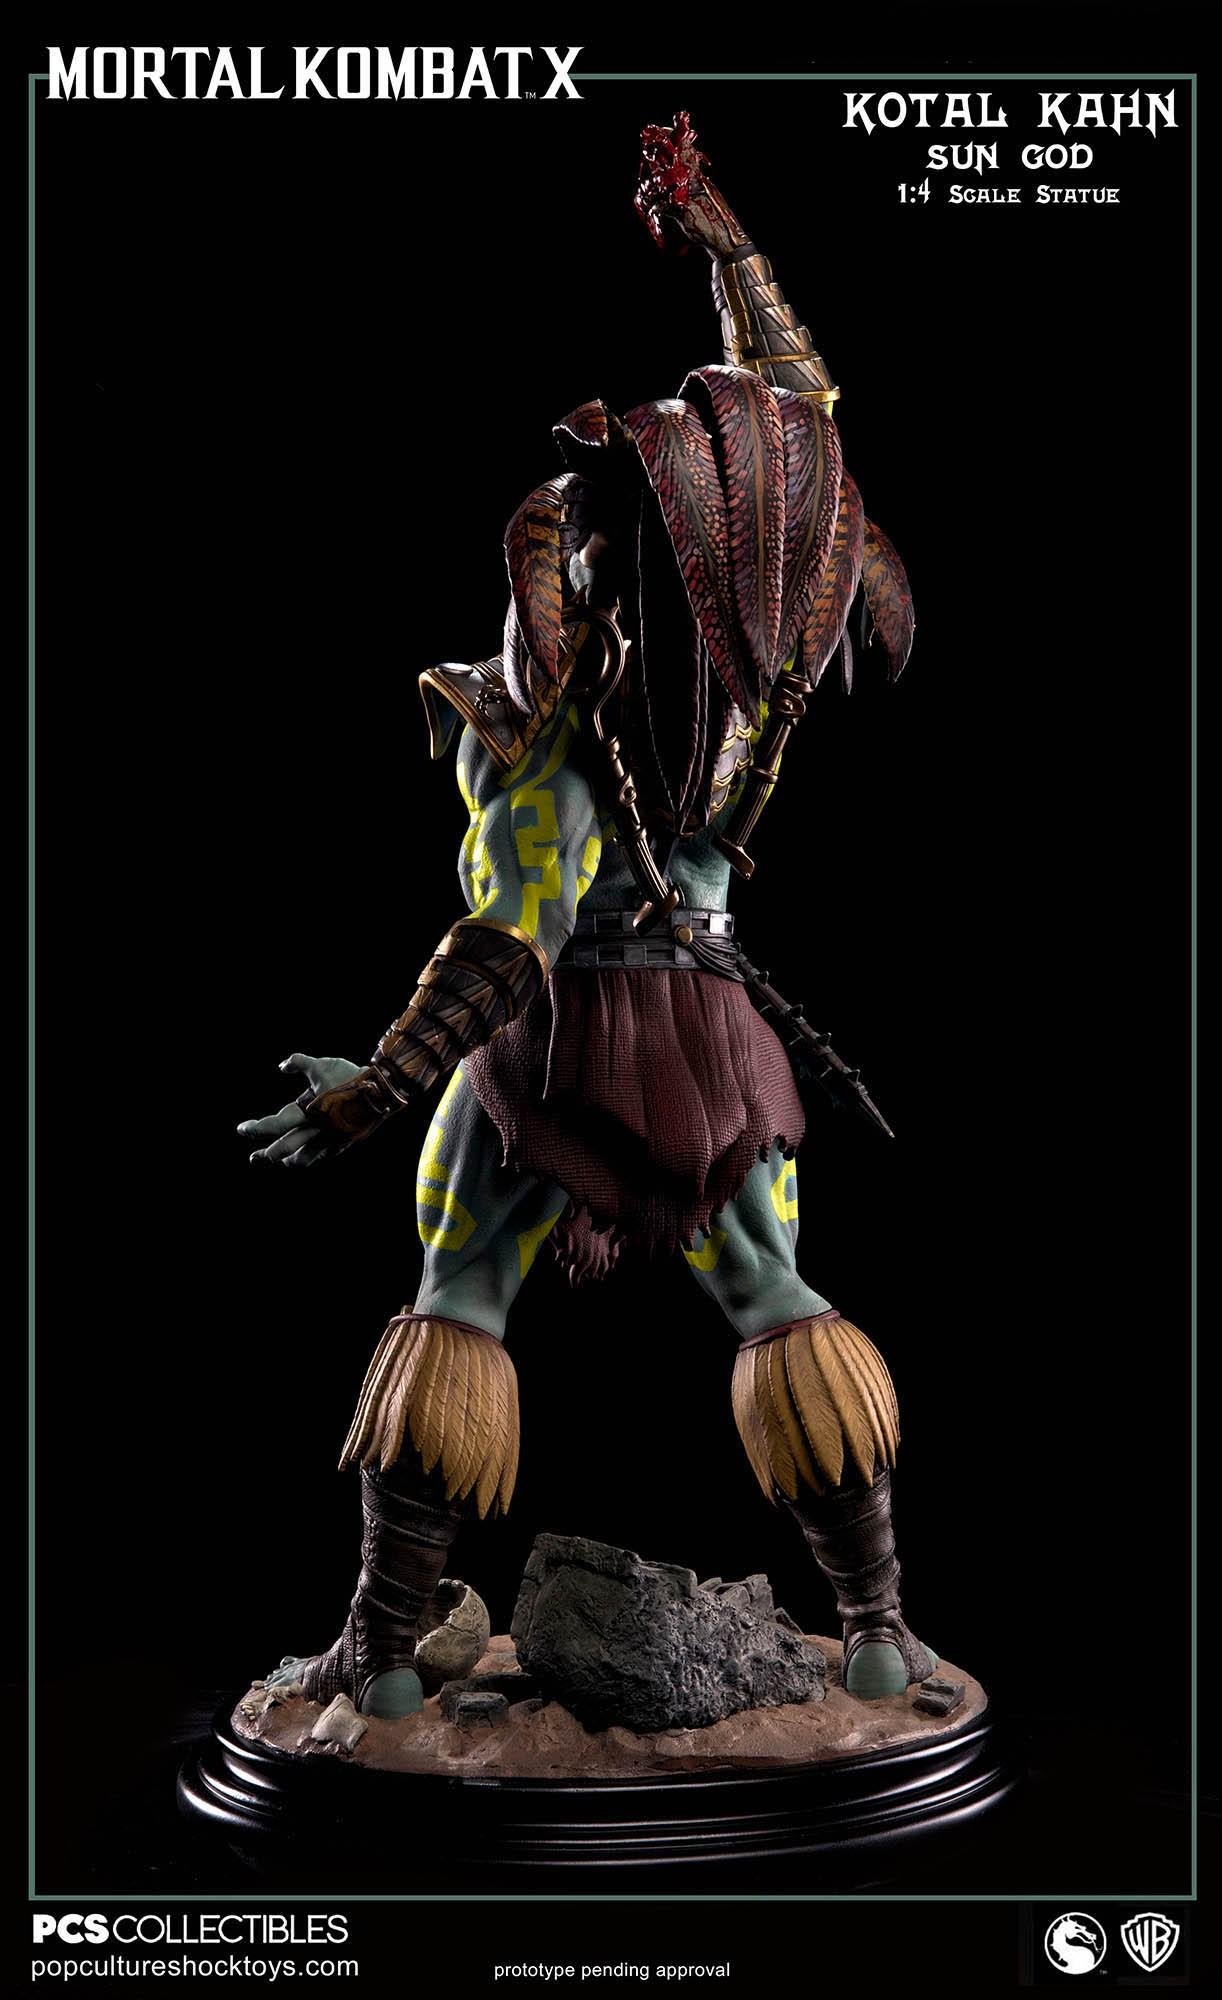 [Pop Culture Shock] Mortal Kombat X: Kotal Kahn 1:4 scale PCS-Kotal-Kahn-Sun-God-010